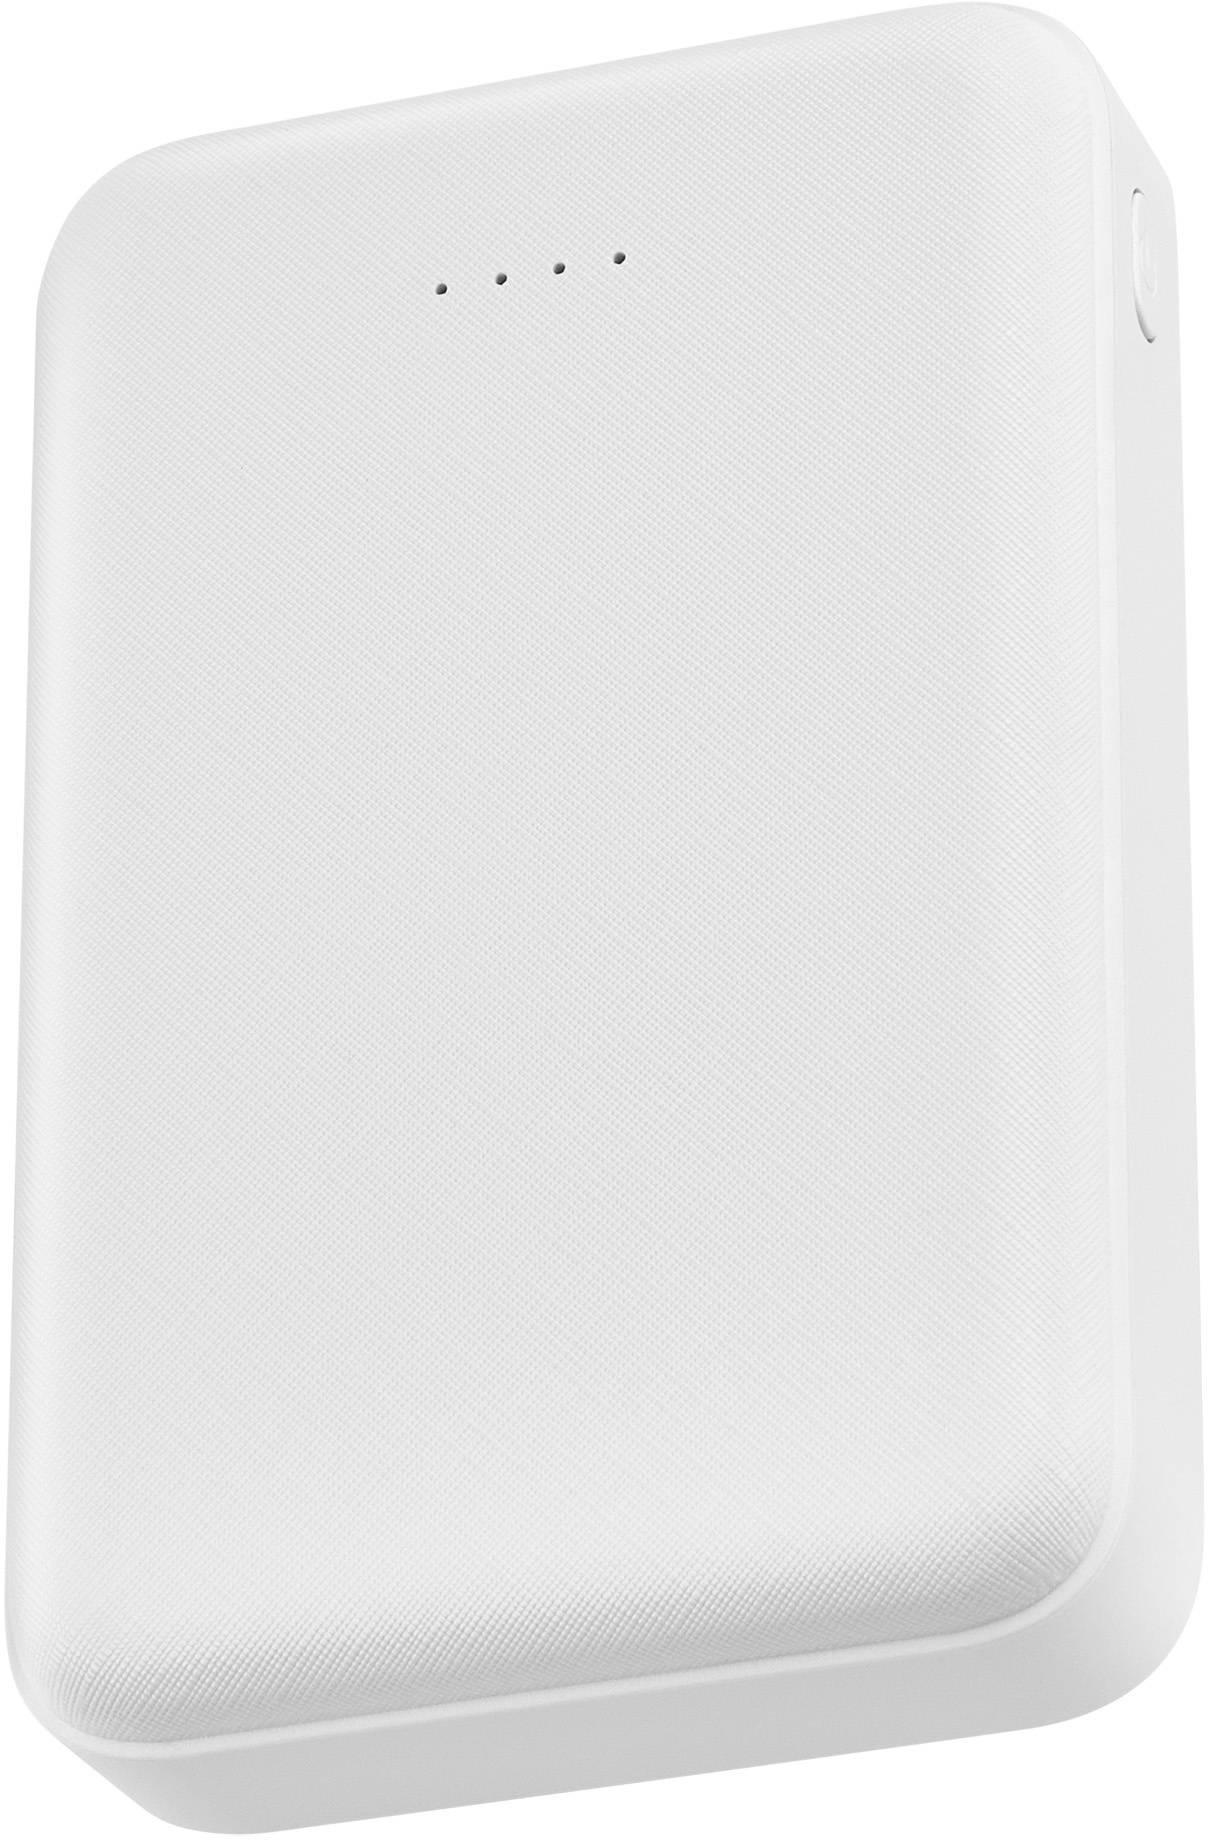 Мобильный аккумулятор BURO T4-10000 белый (T4-10000-WT) - фото 1